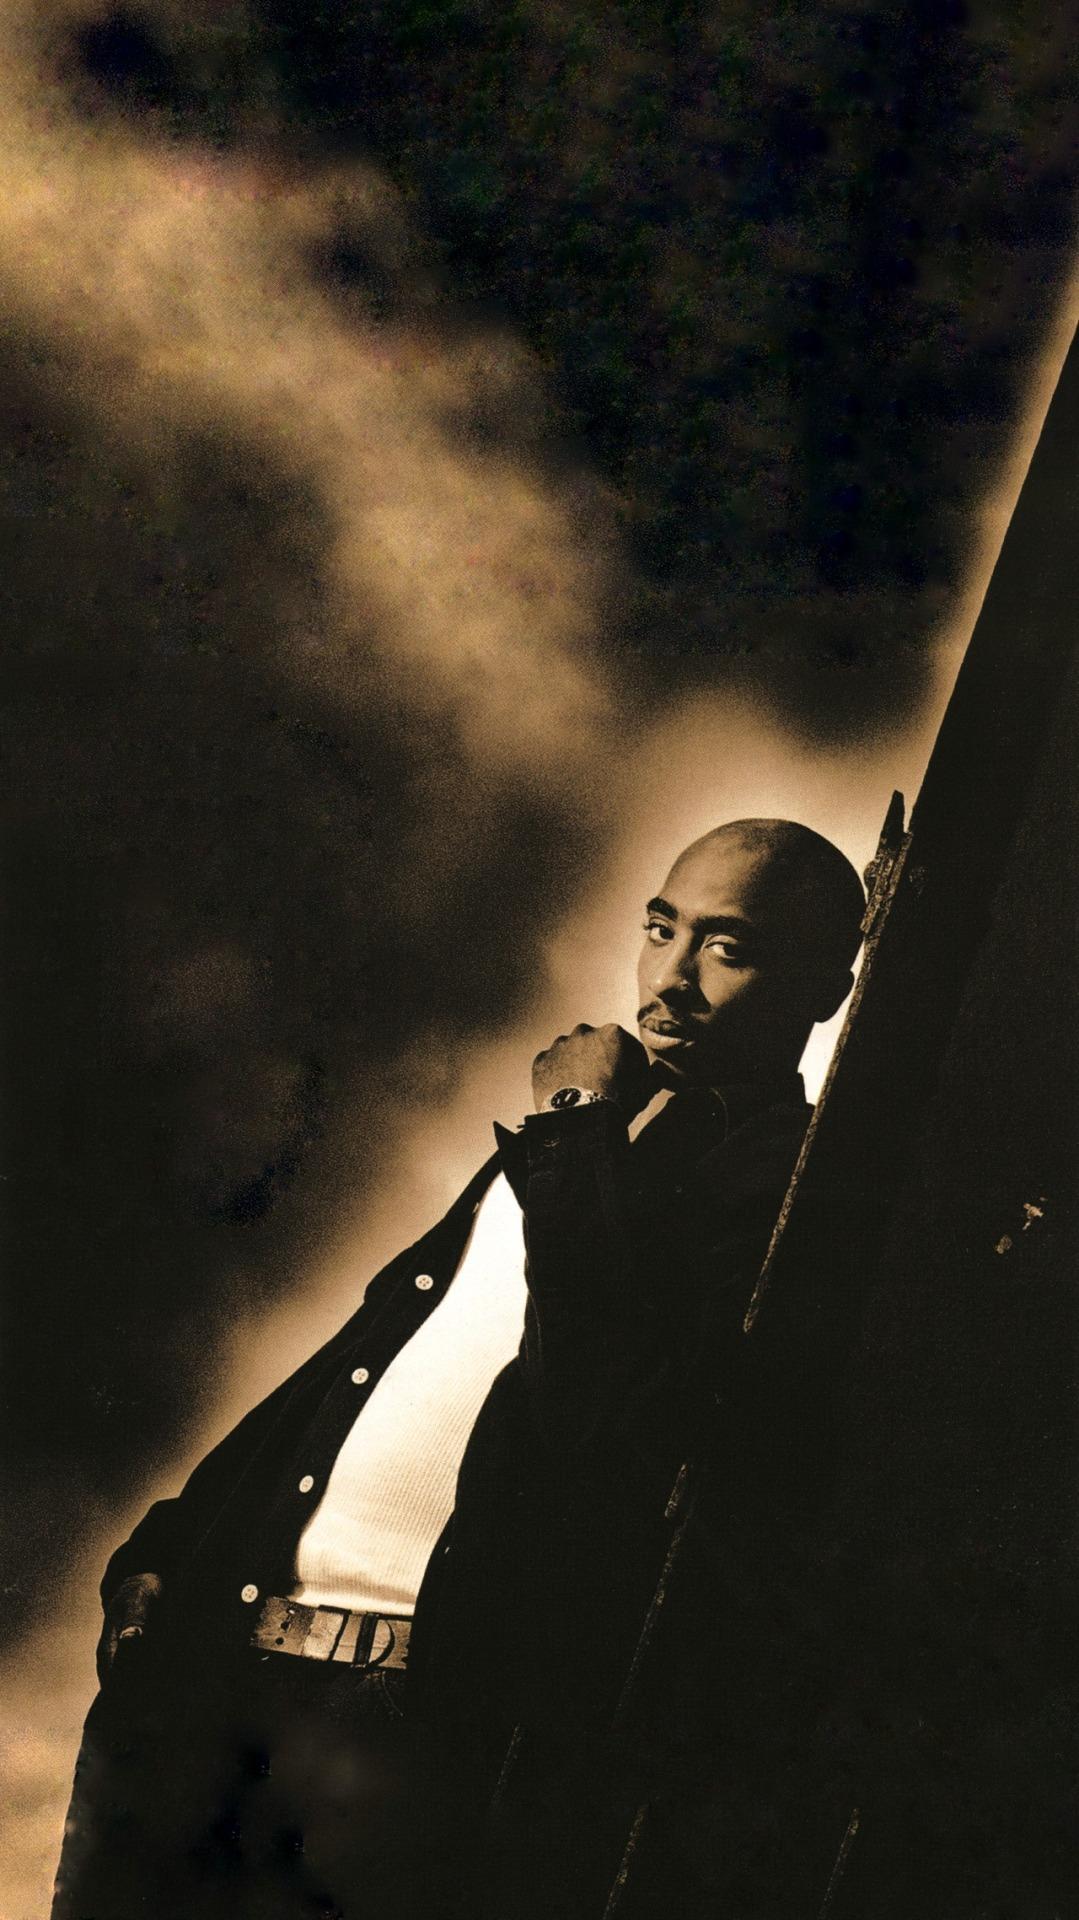 Tupac Shakur Me Against The World : tupac, shakur, against, world, Music, Mobile, Wallpapers, Against, World